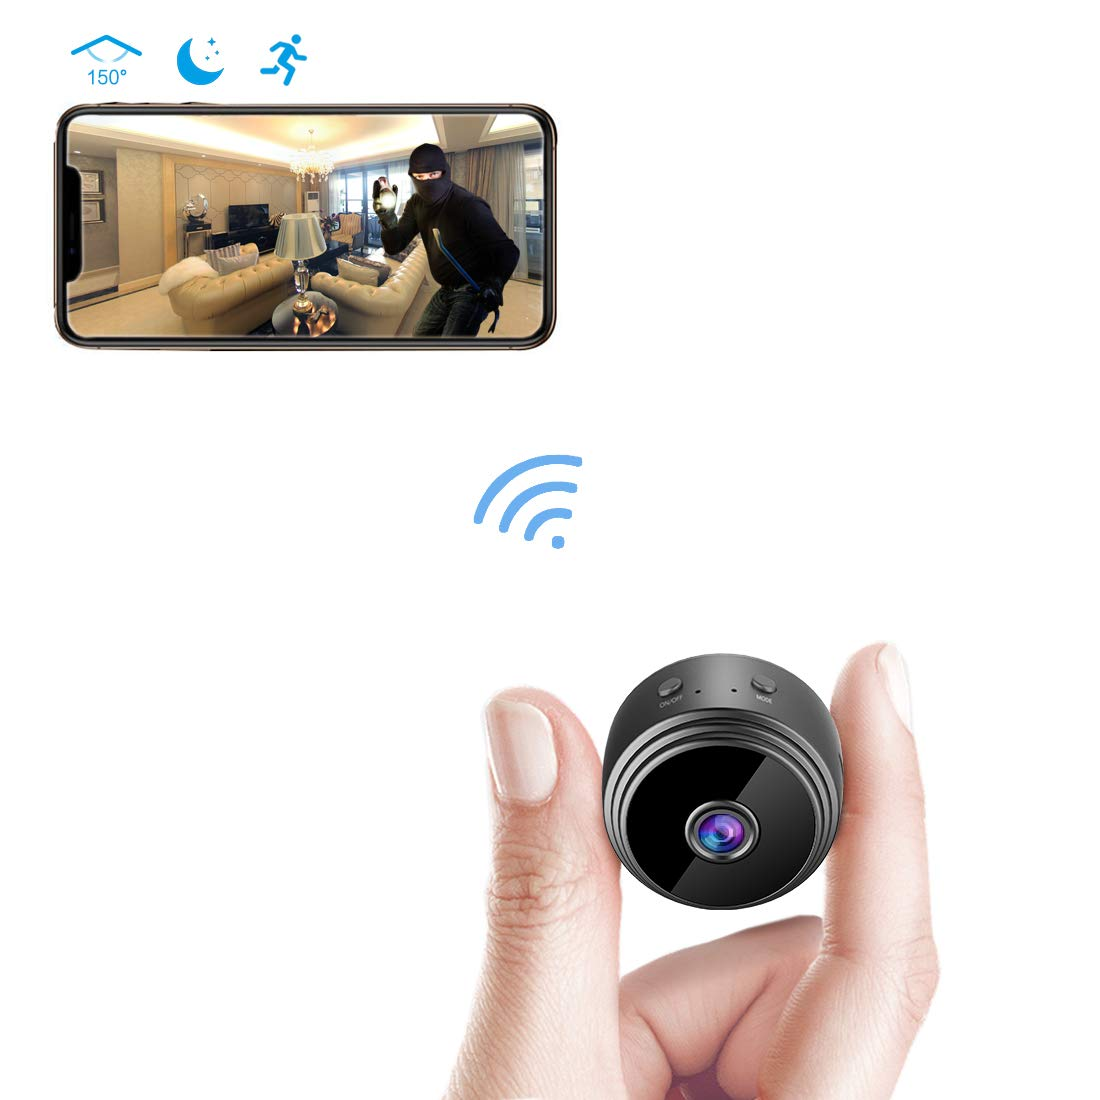 1080P Wireless WiFi IP Camera Mini Camera Portable Home Security Camera Video Recorder Camcorder Night Vision